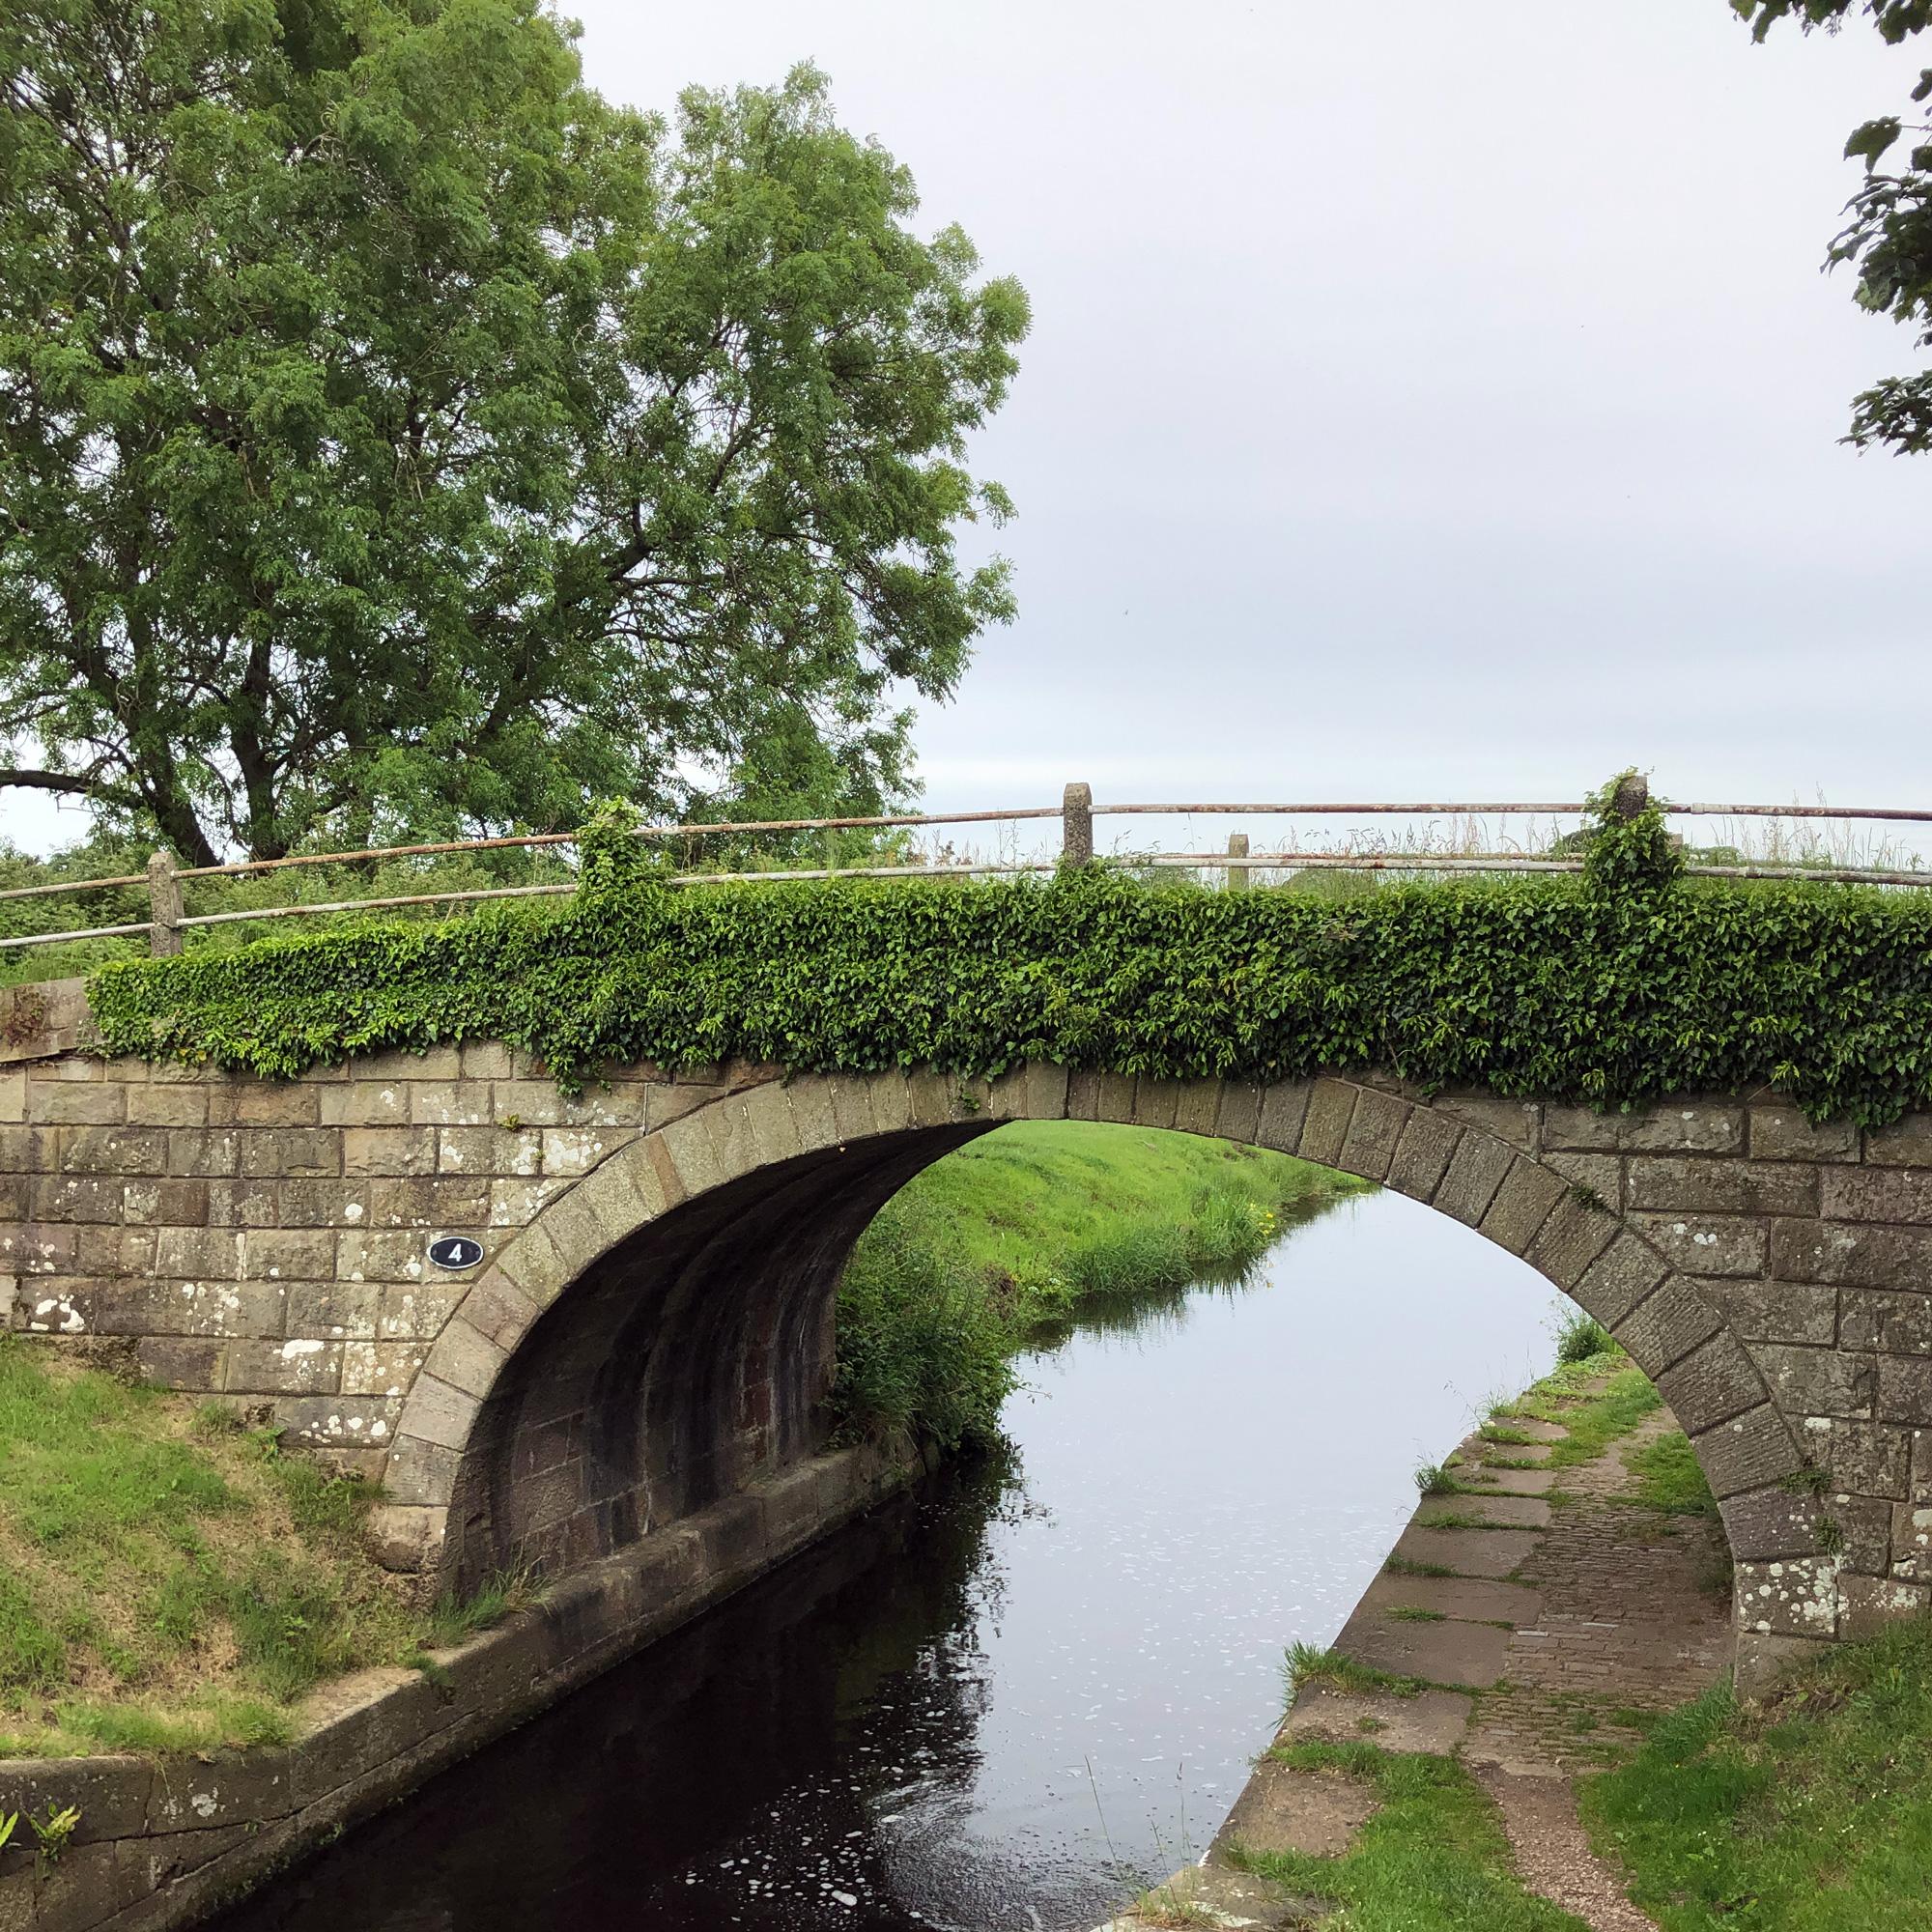 Bridge over towpath